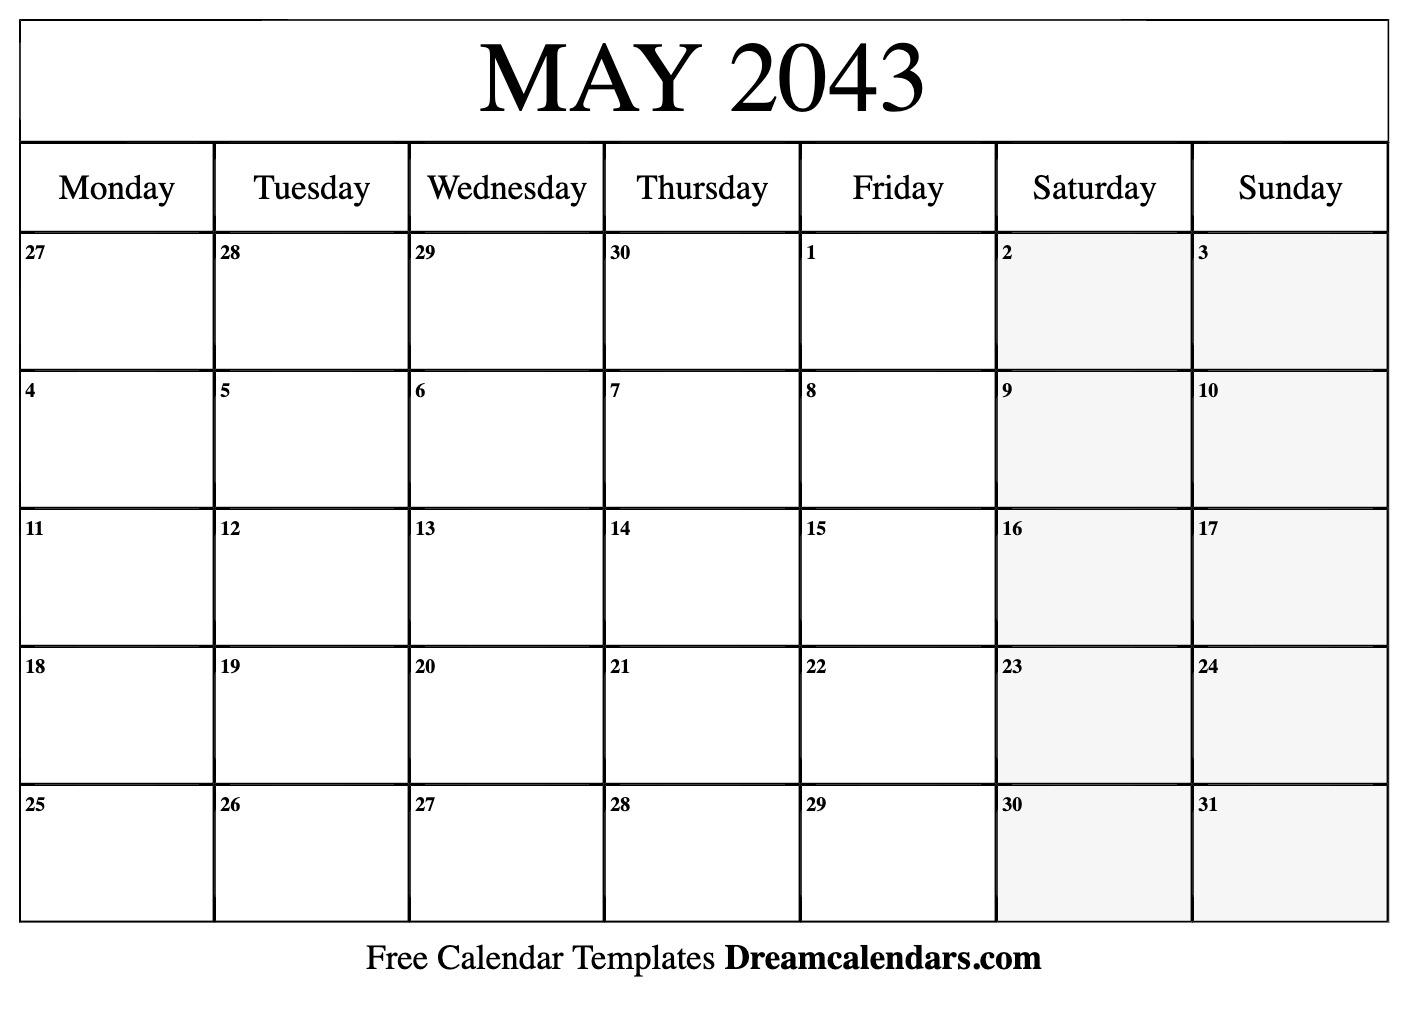 May 2043 Calendar | Free Blank Printable Templates